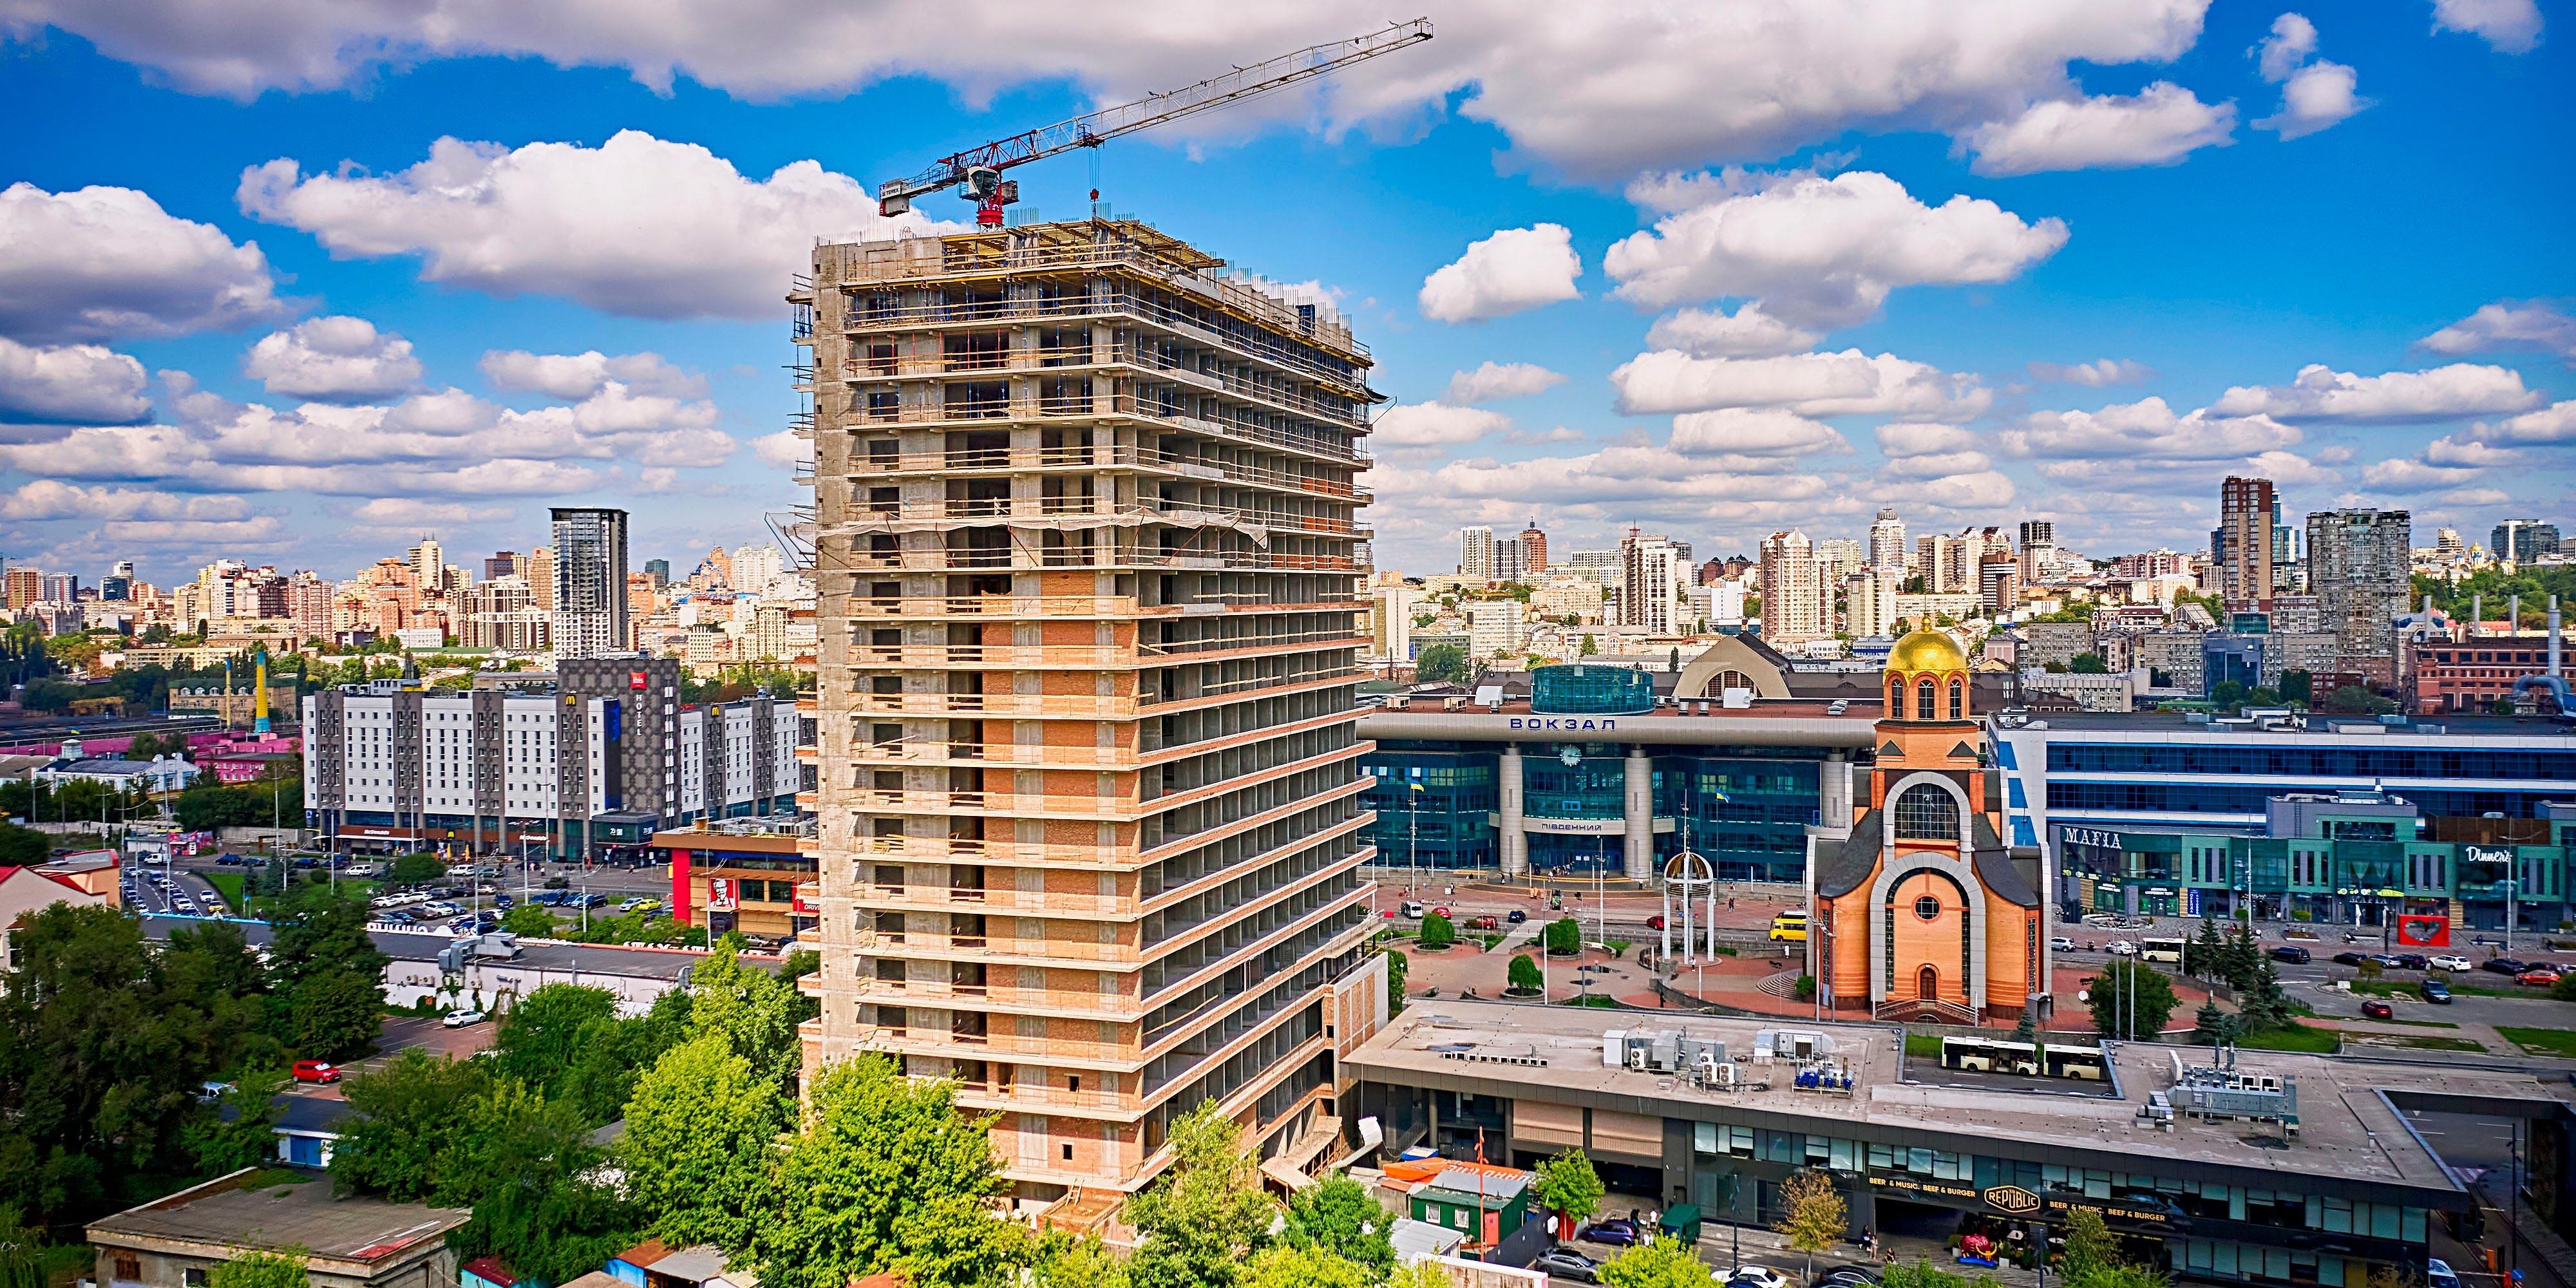 CONSTRUCTION PROGRESS OF S1 TERMINAL. August 2021